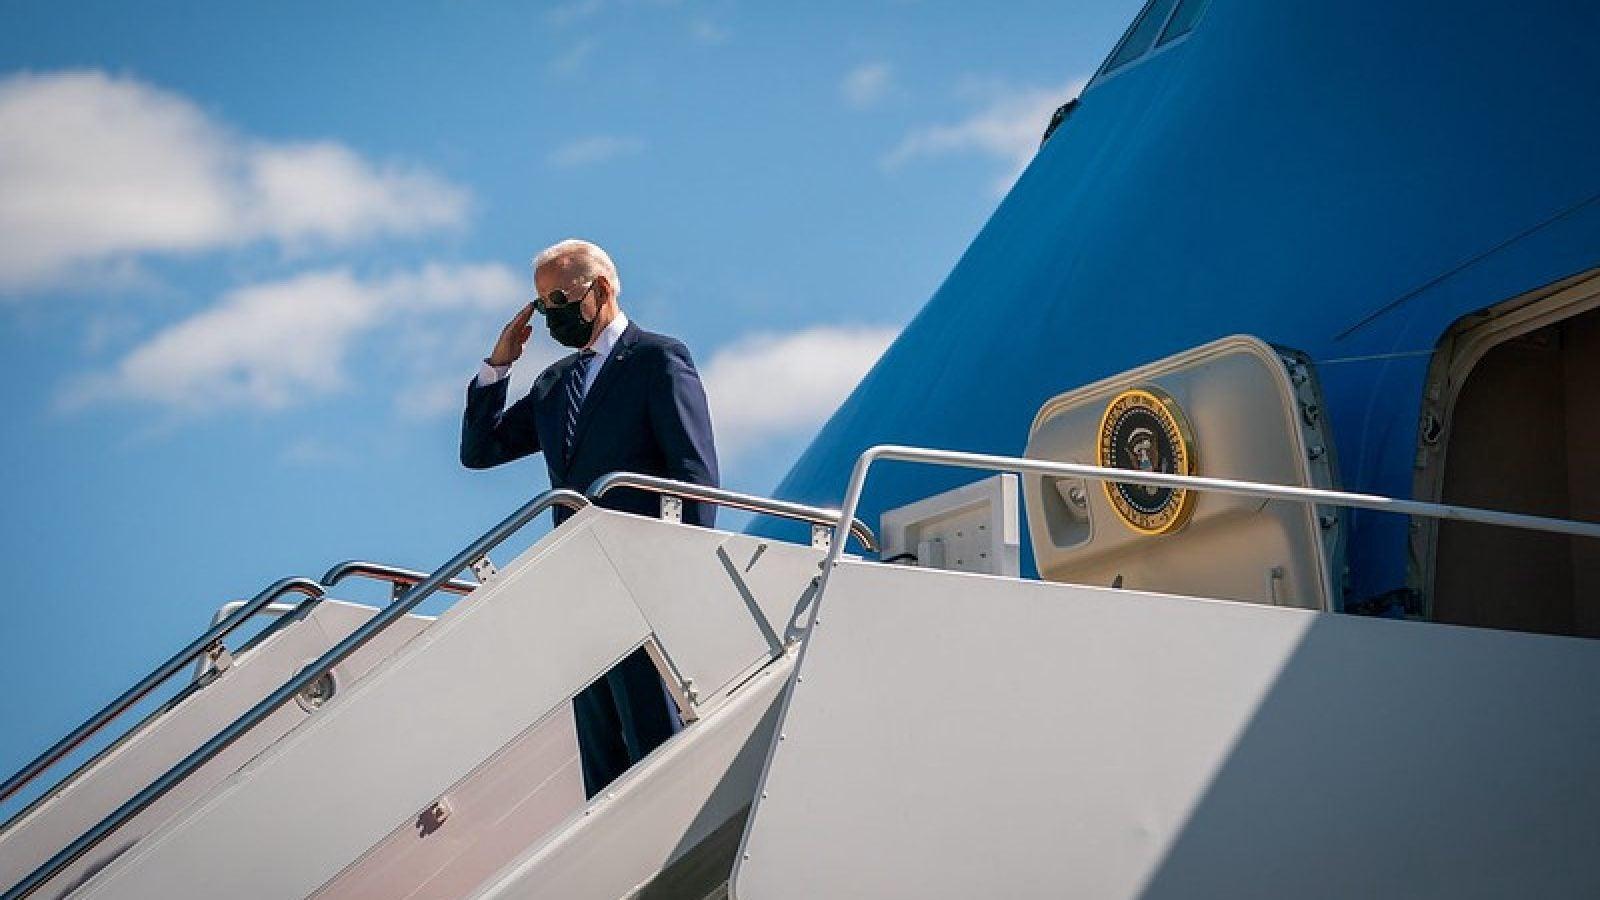 President Joe Biden disembarks Air Force One. (Image: White House/Adam Schultz/Flickr)